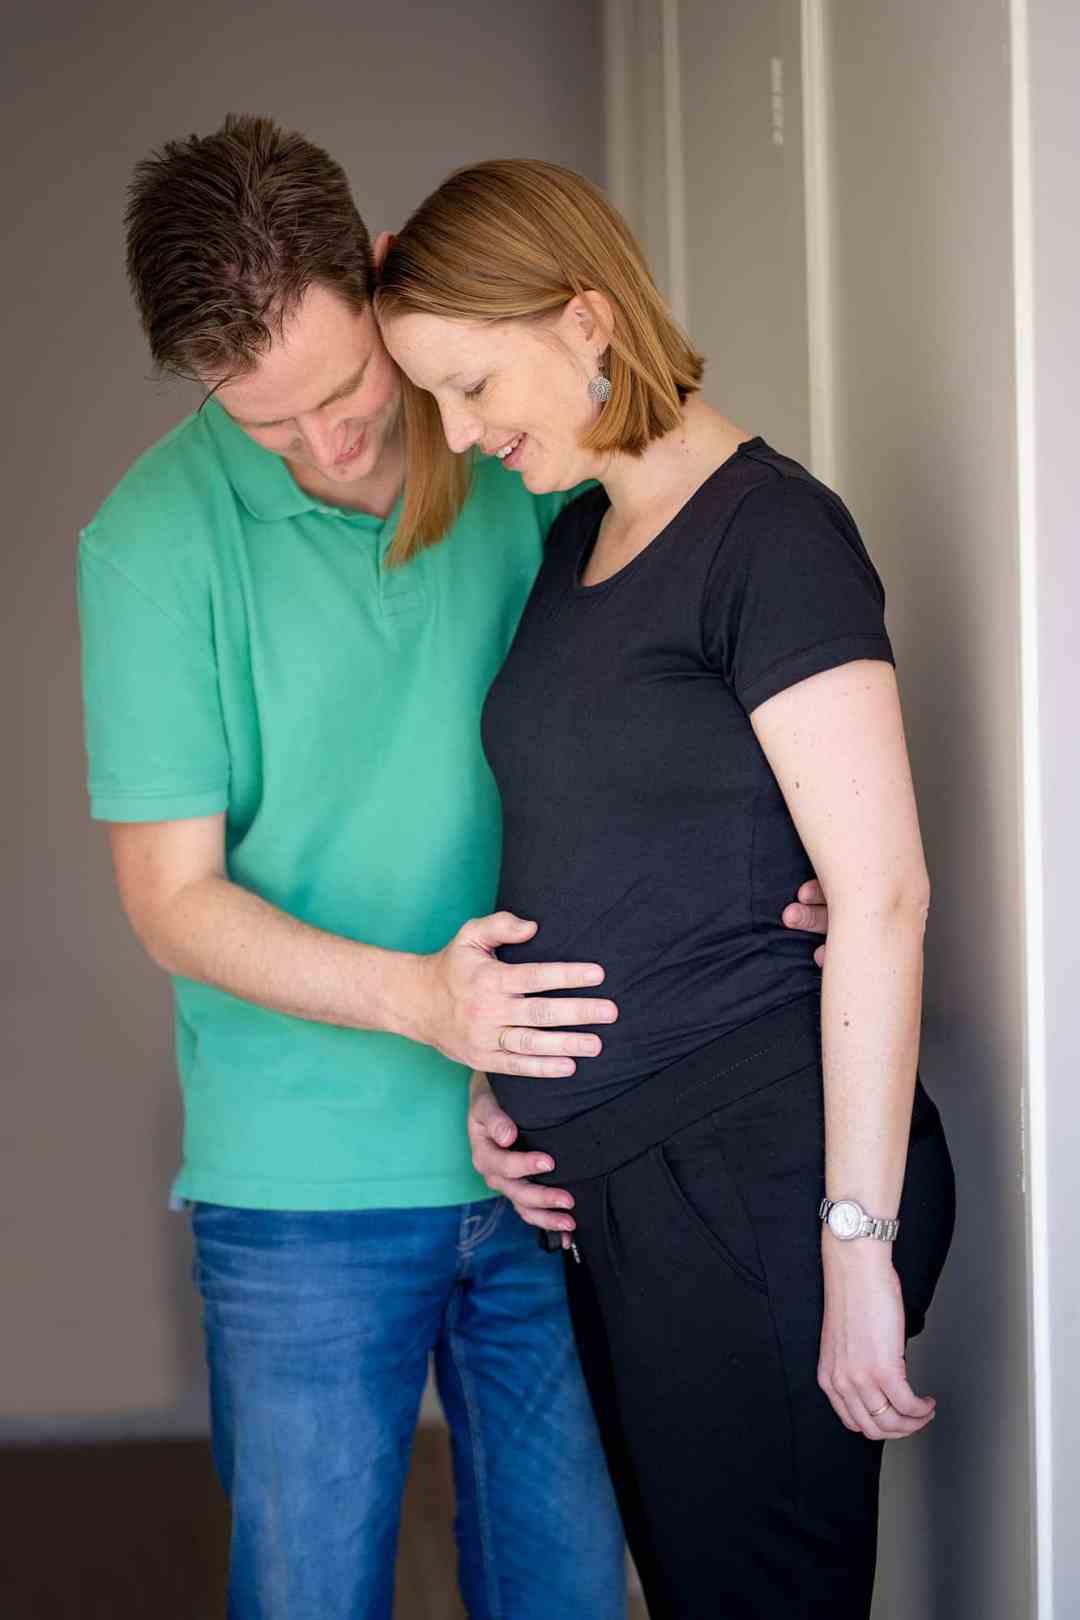 deurportret zwanger